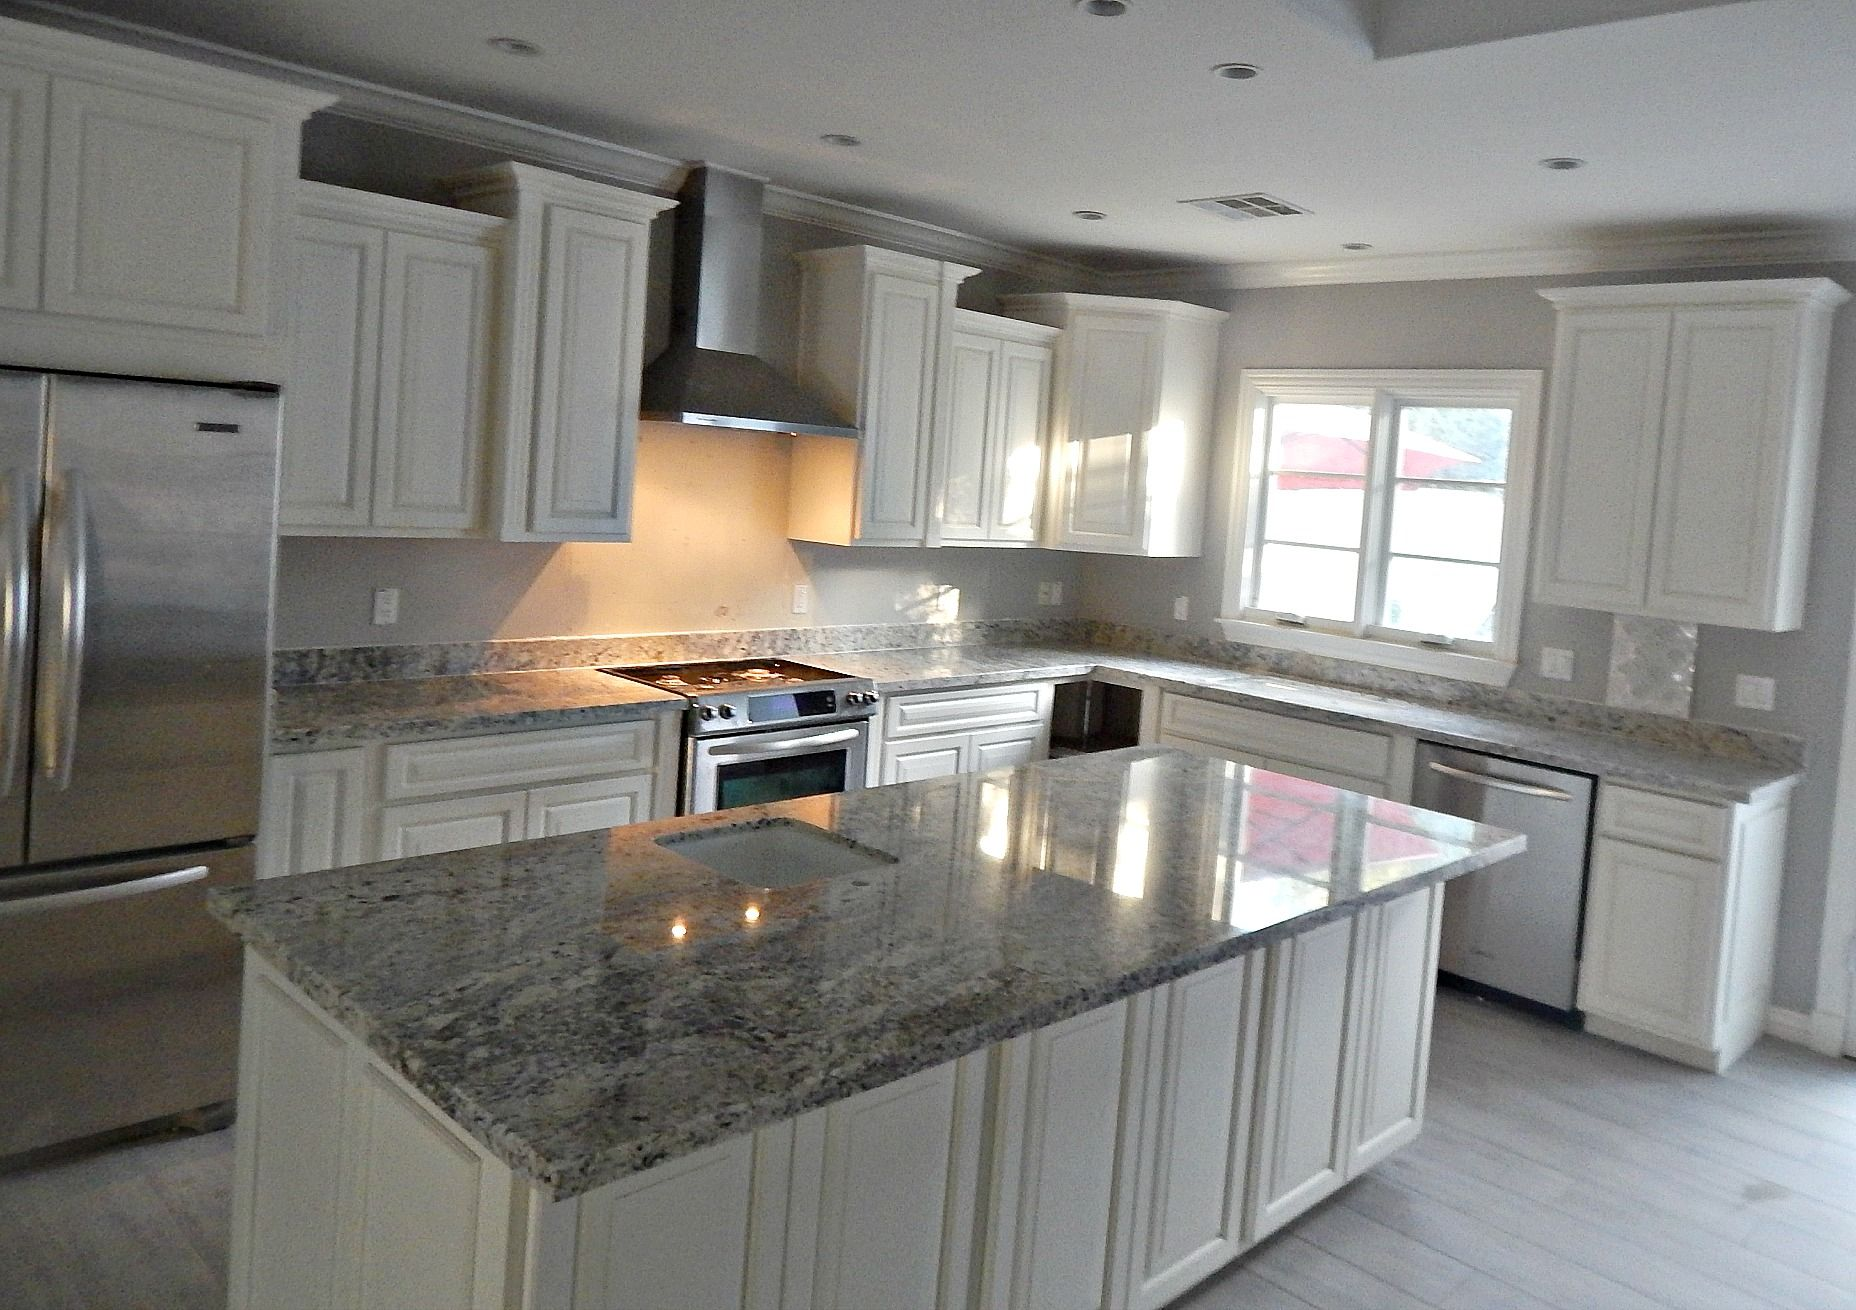 Delightful White Ice Granite Countertop Remodel With Flat Polish Edge. (602) 358 8888